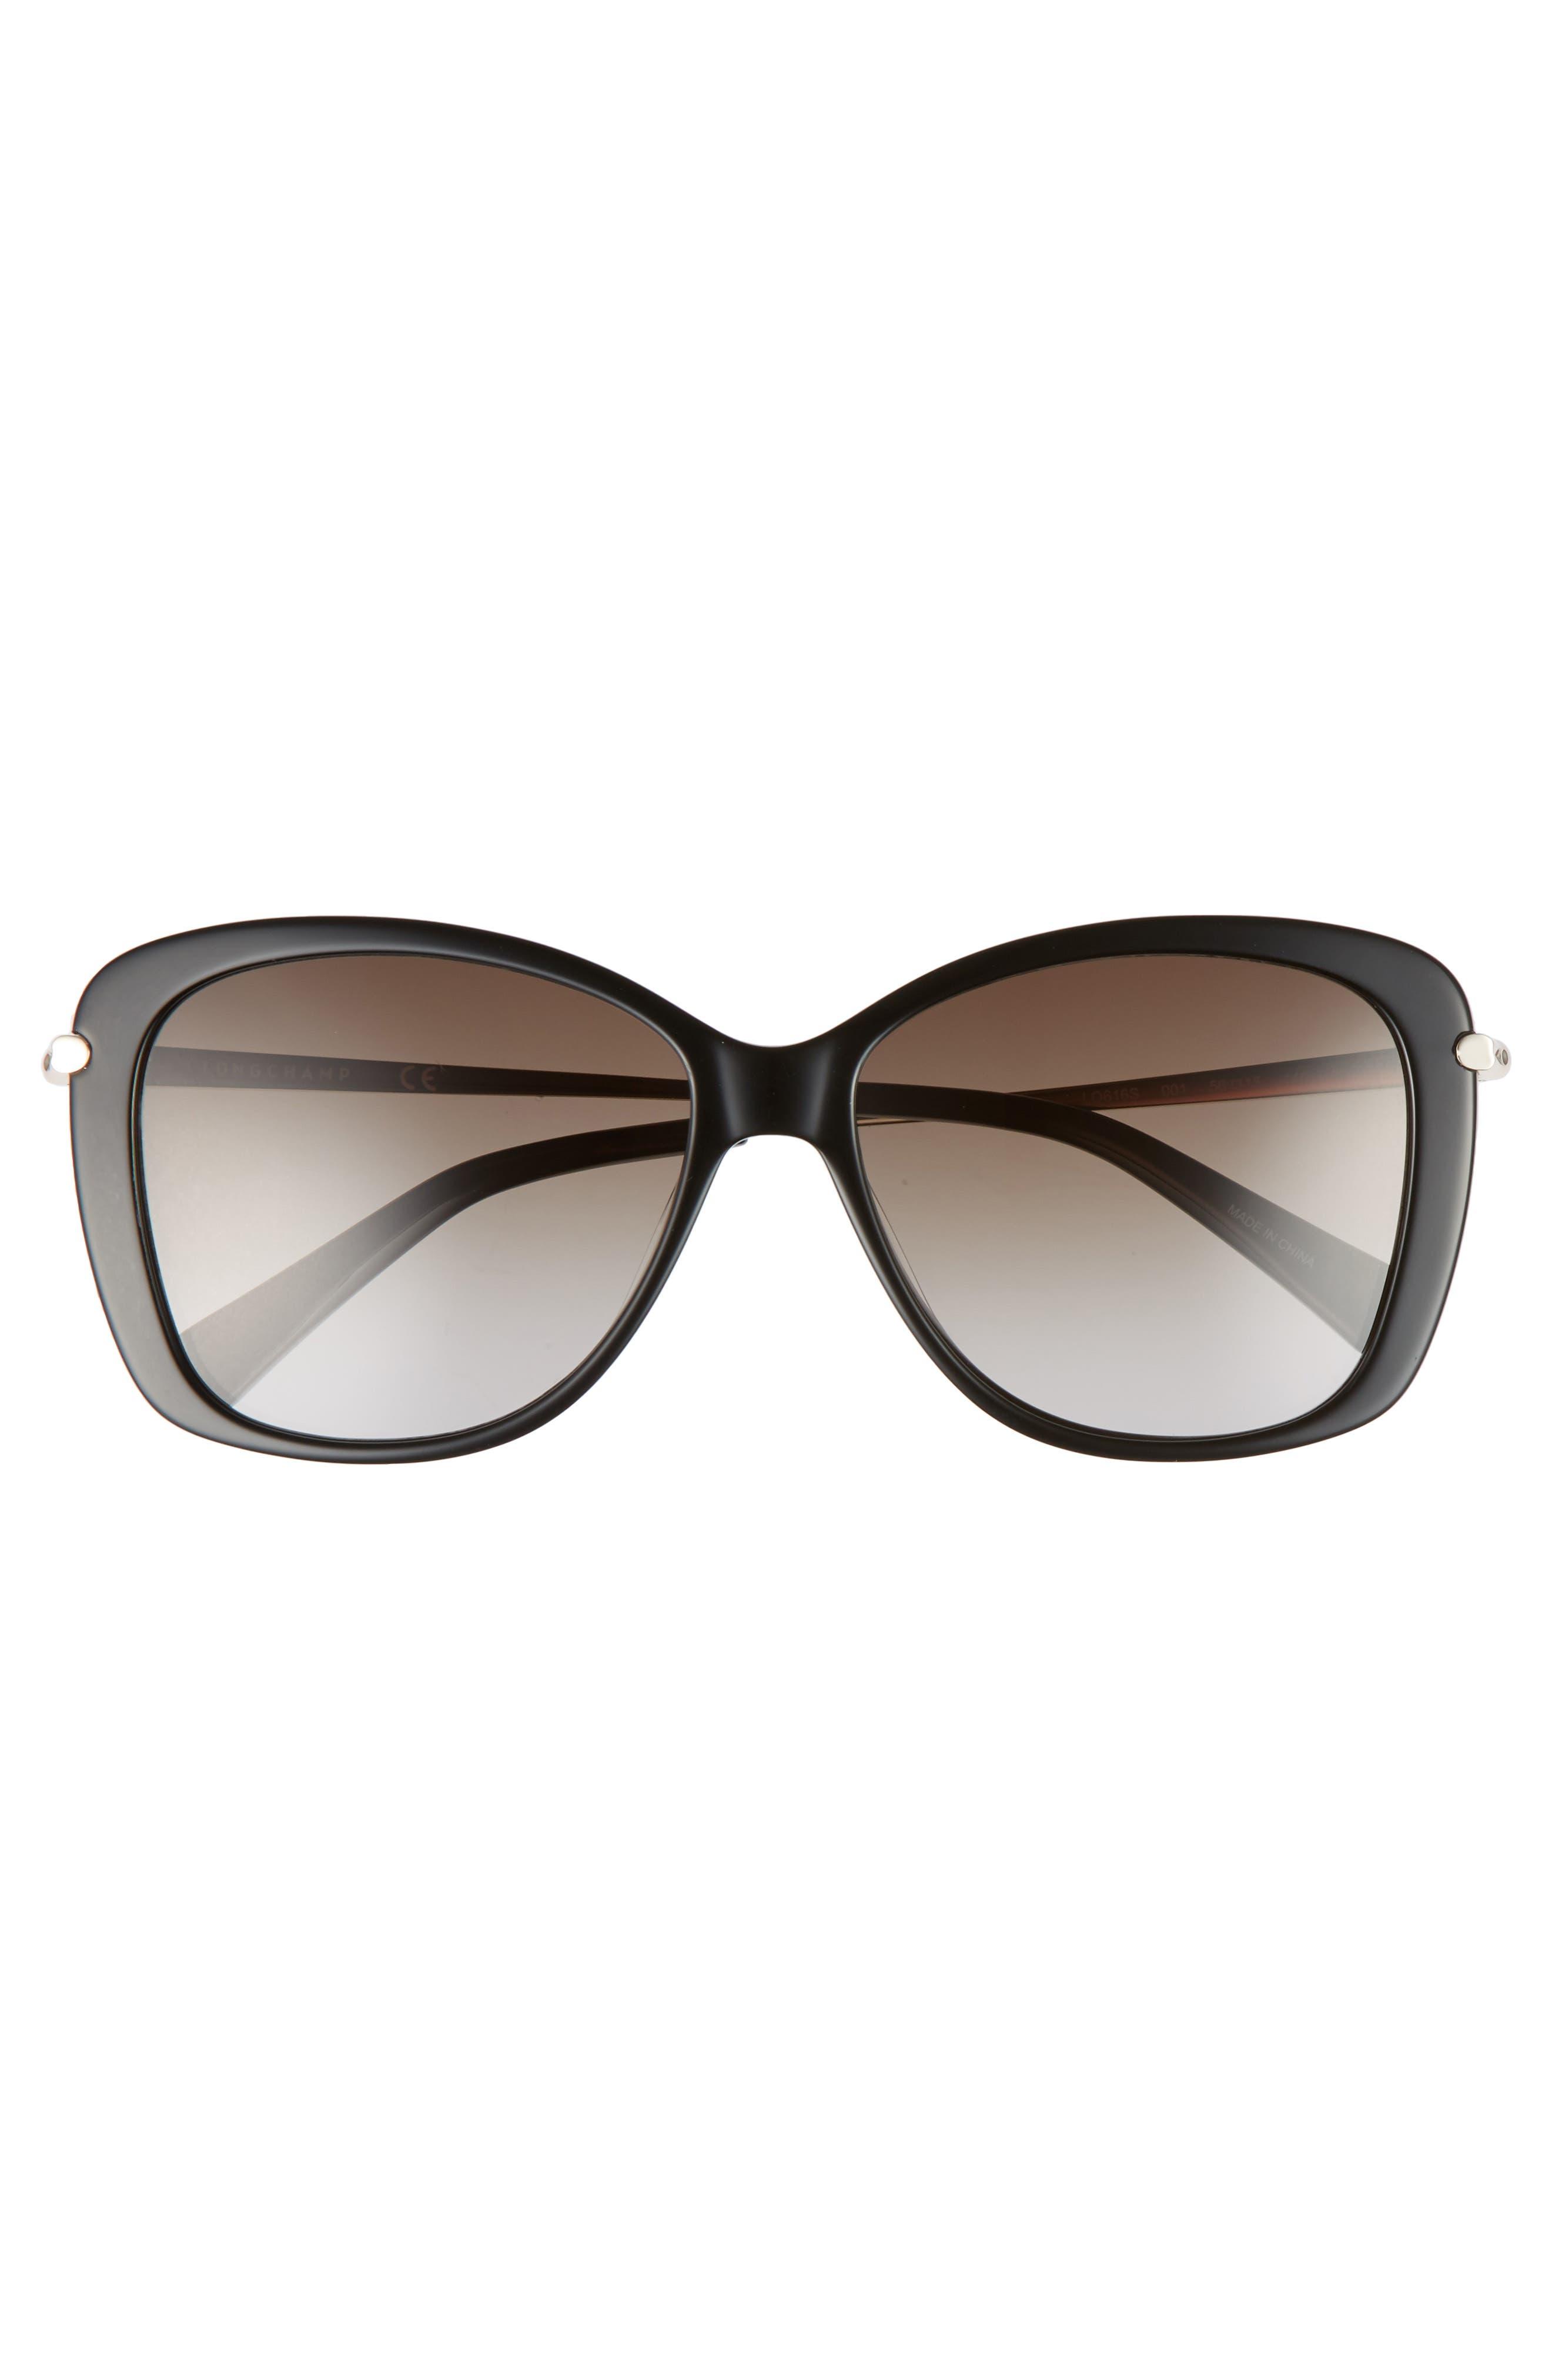 56mm Gradient Lens Butterfly Sunglasses,                             Alternate thumbnail 3, color,                             BLACK